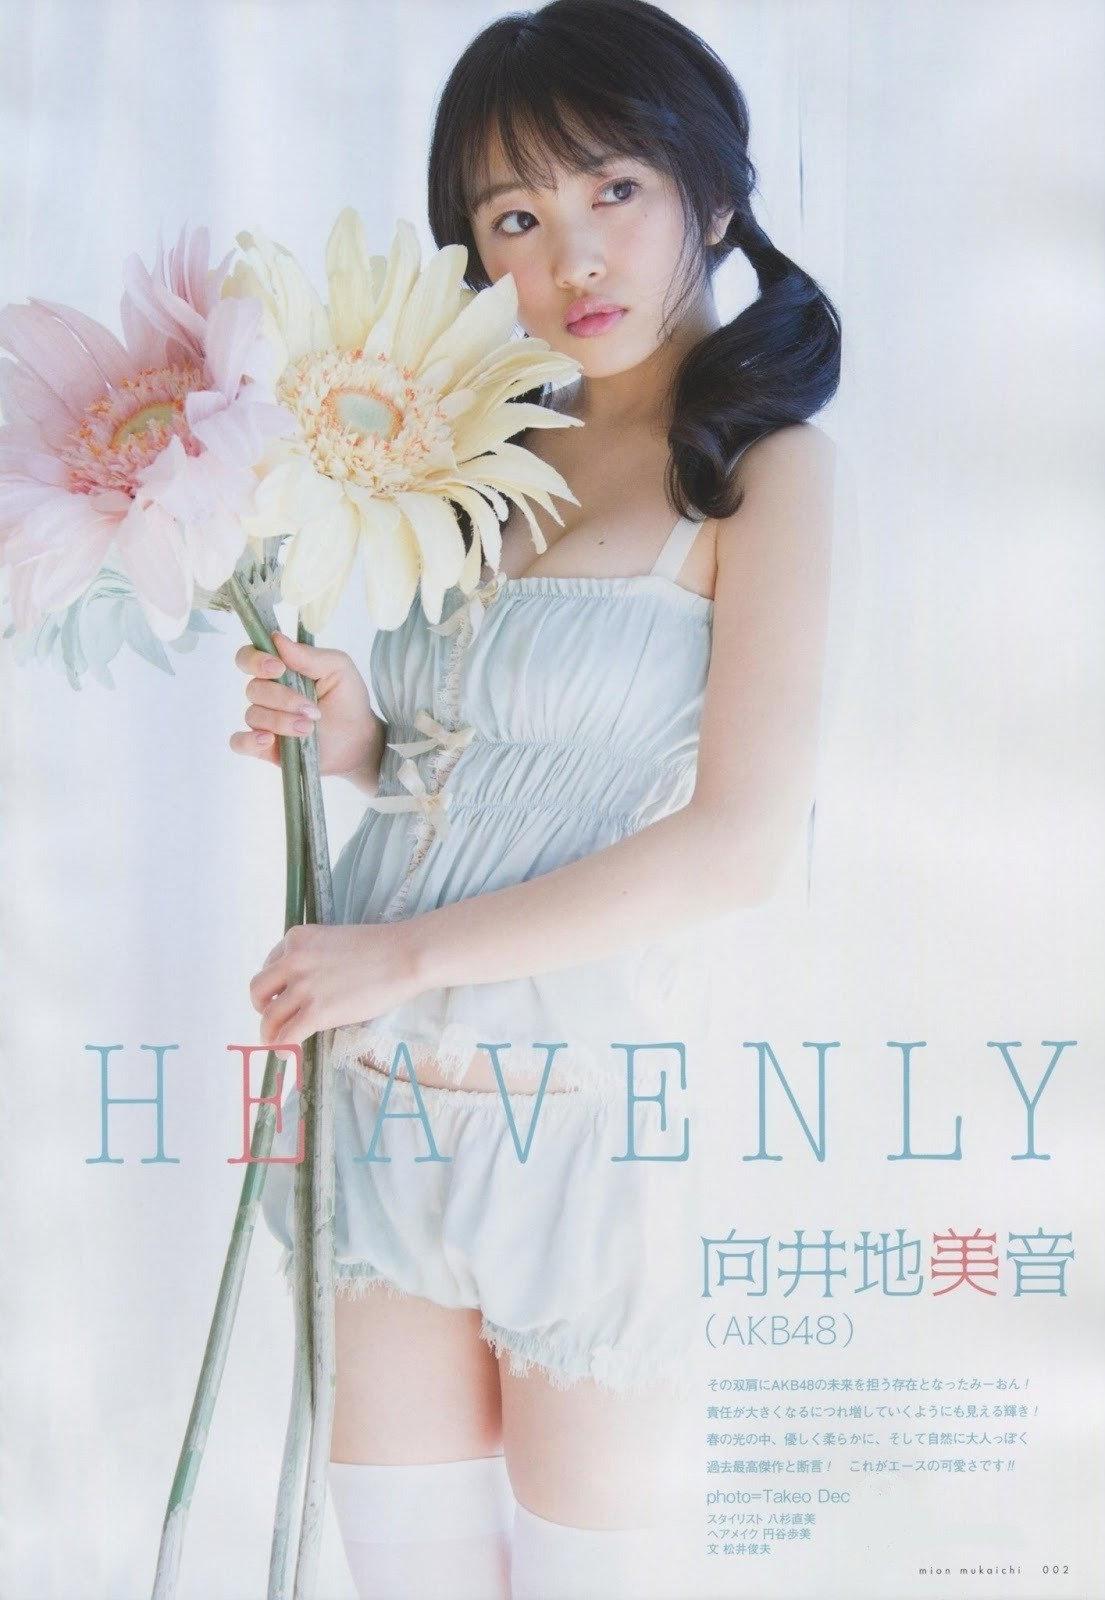 Mukaichi Mion 向井地美音 AKB48, UTB 2017.07 Vol.255 (アップトゥボーイ 2017年07月号)